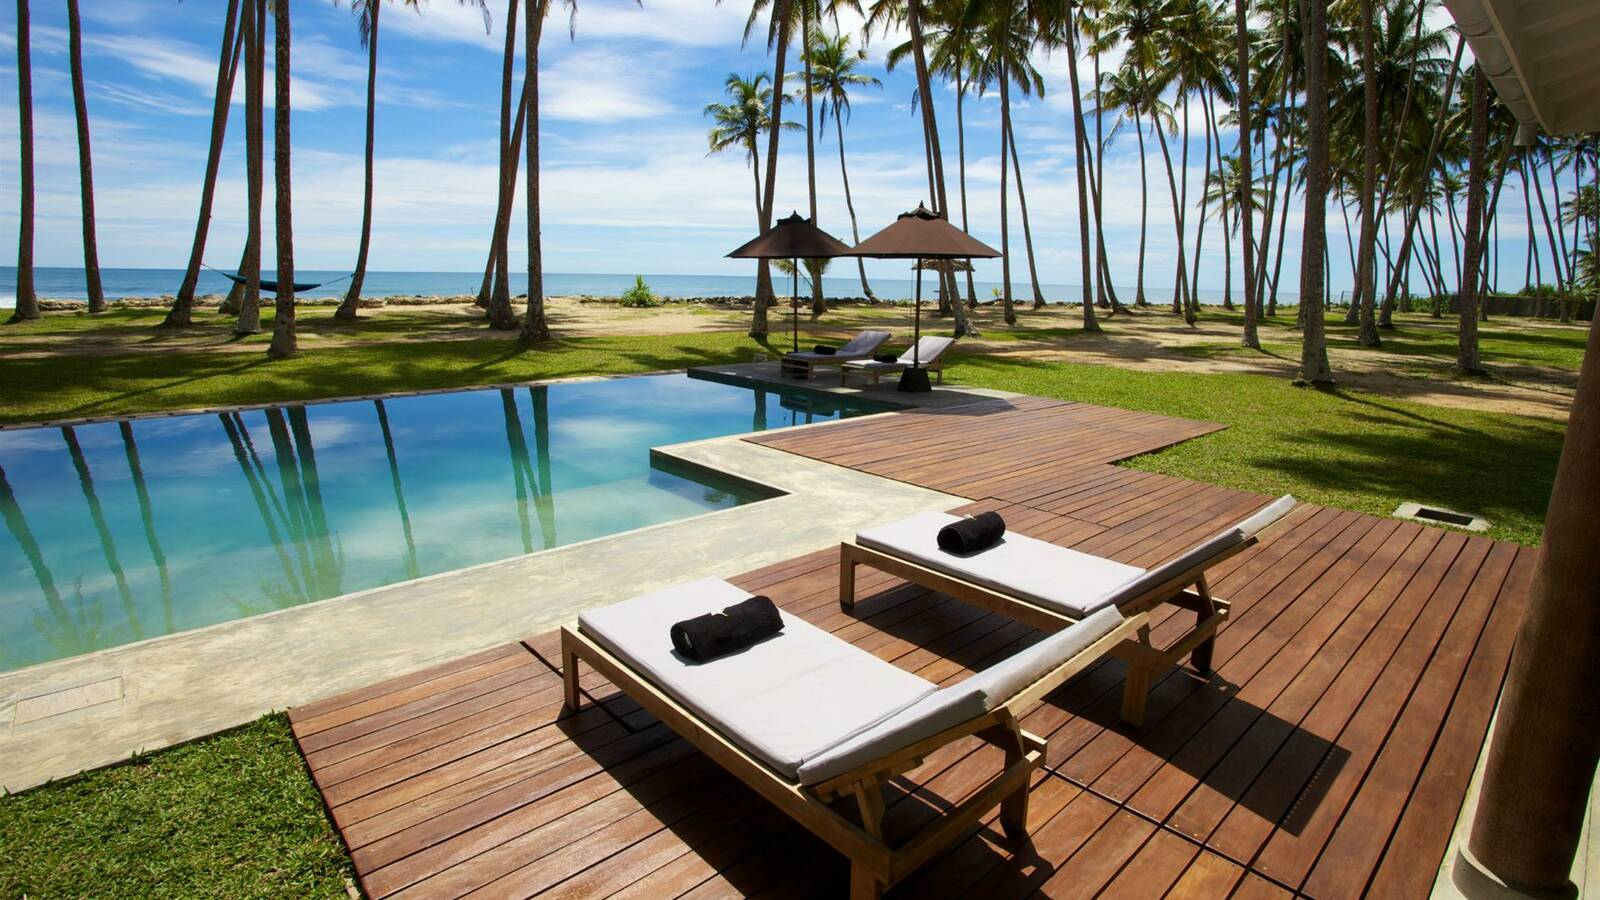 Koggala Fortress Resort Piscine Circuit Sri Lanka